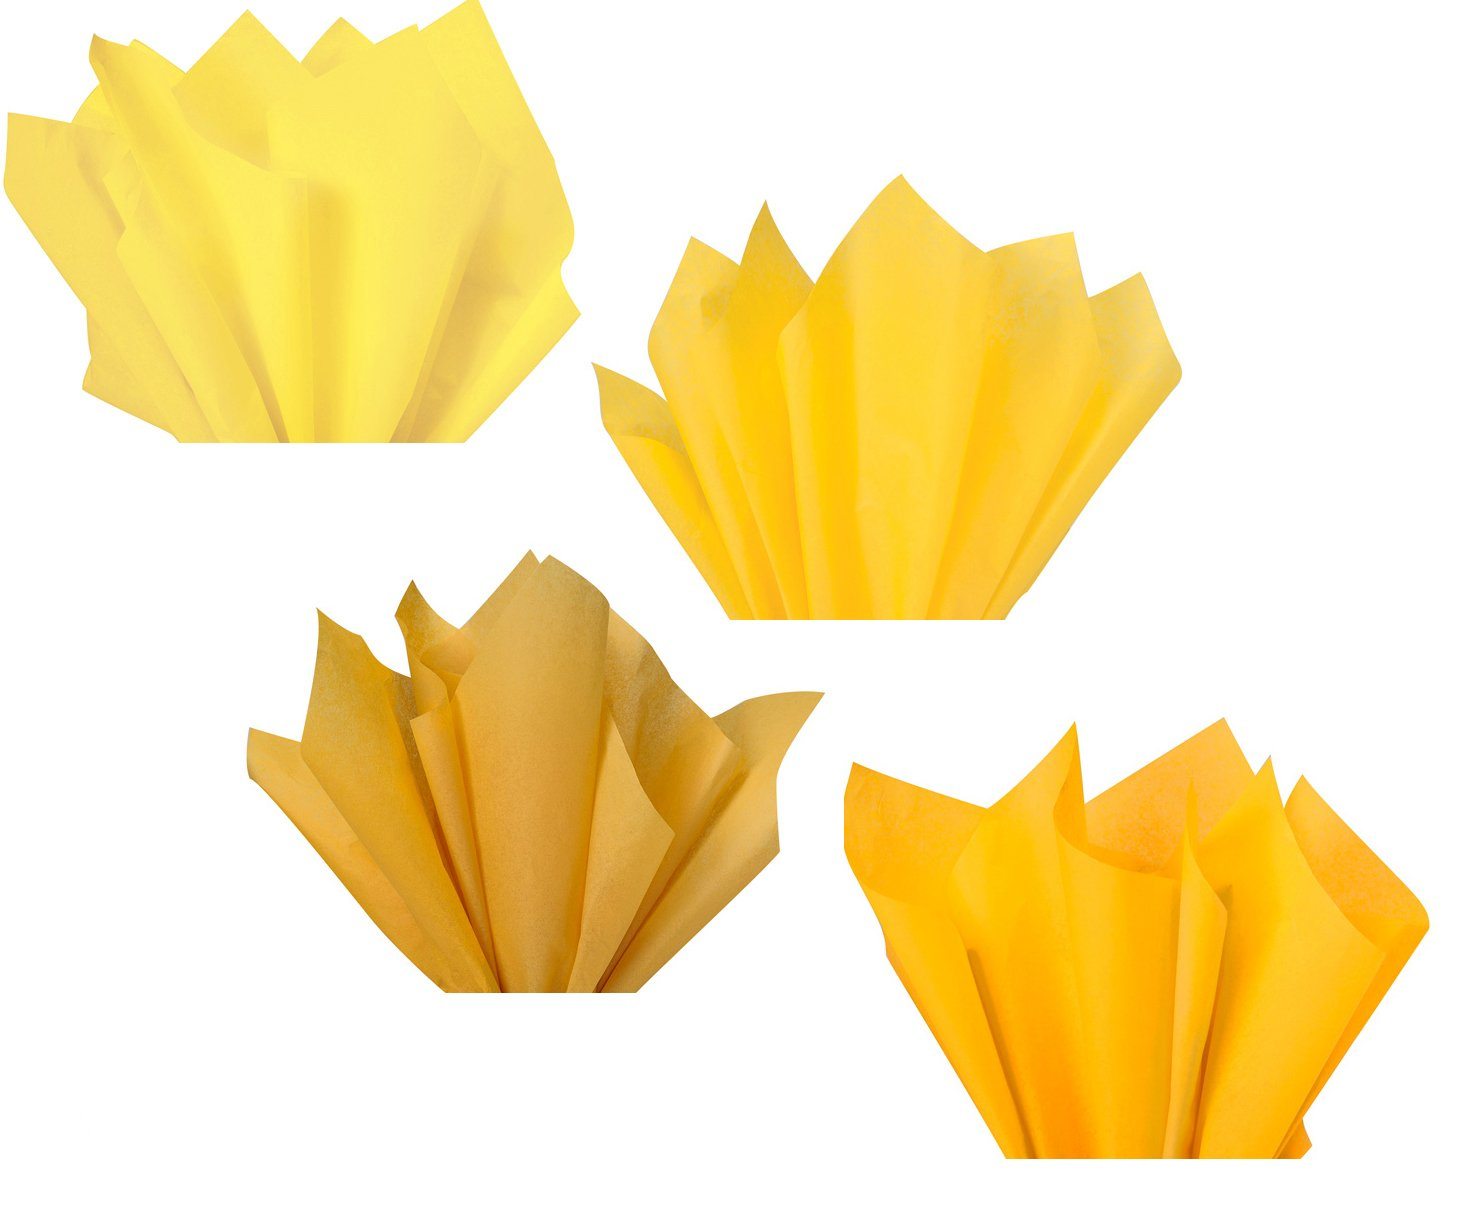 Yellow Lemon Gold Mustard Amber Assorted Colored Multi-Pack Tissue Paper for Flower Pom Poms Art Craft Decor Wedding Bridal Baby Shower Party Gift Bag Basket Filler Decoration by Secret for Longevity